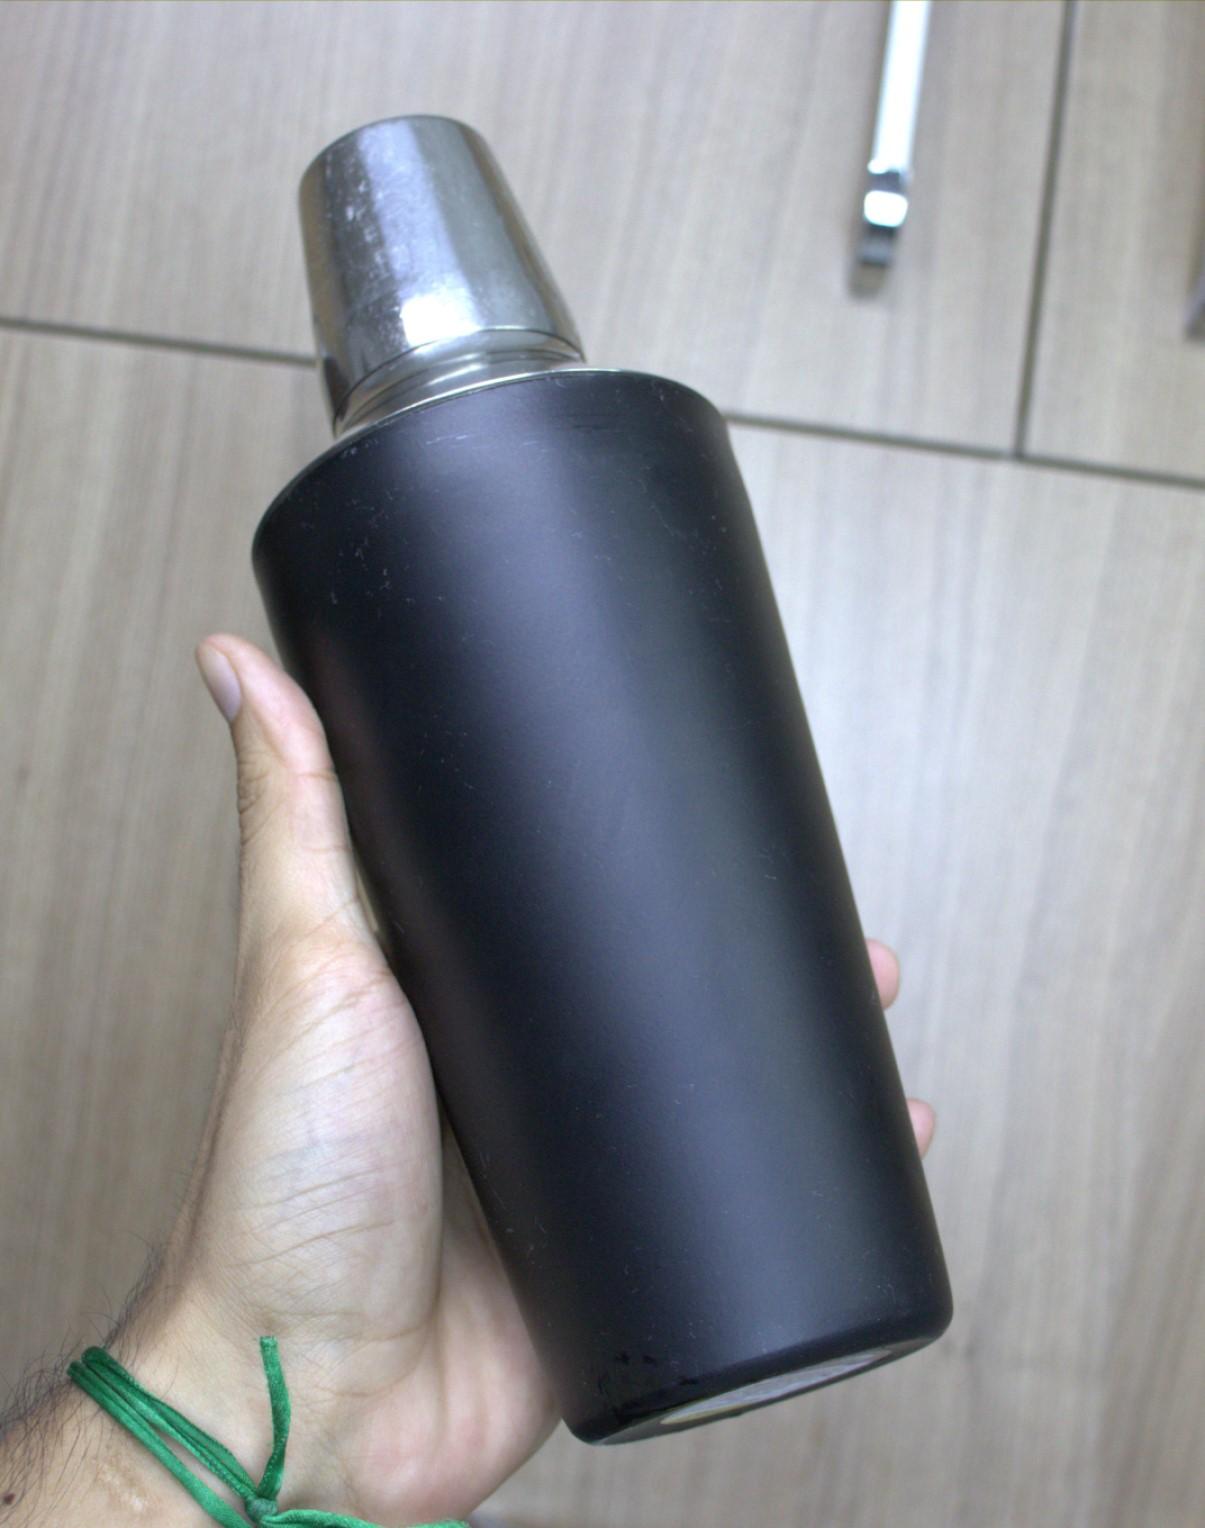 coqueteleira inox 750mL cor preta para drinks barman bartender